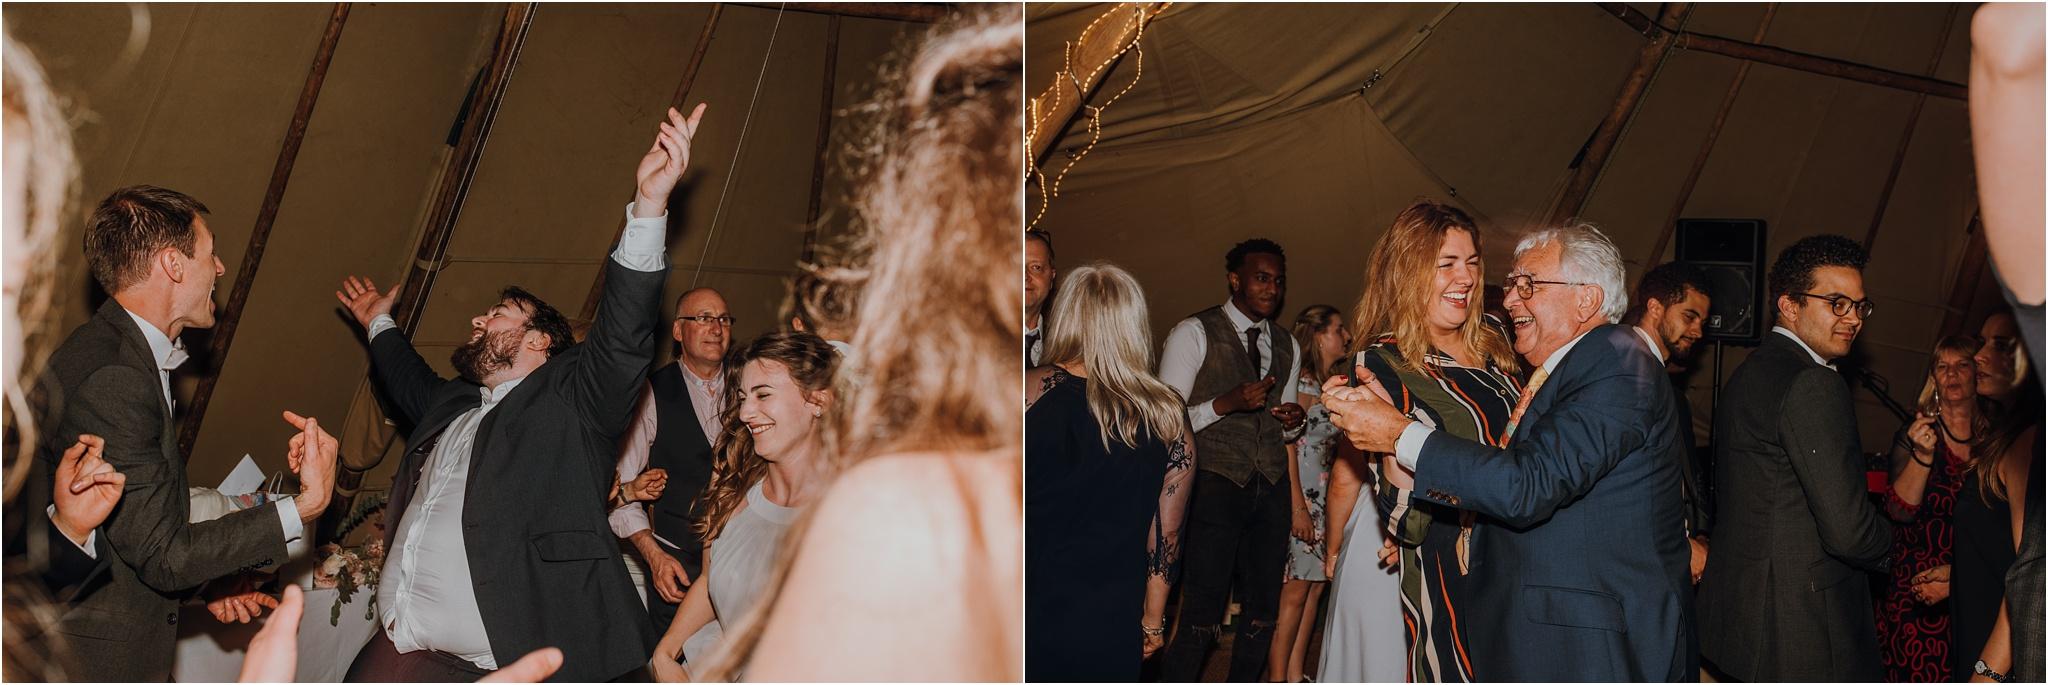 Outdoor-country-wedding-Edinburgh-photographer__0263.jpg